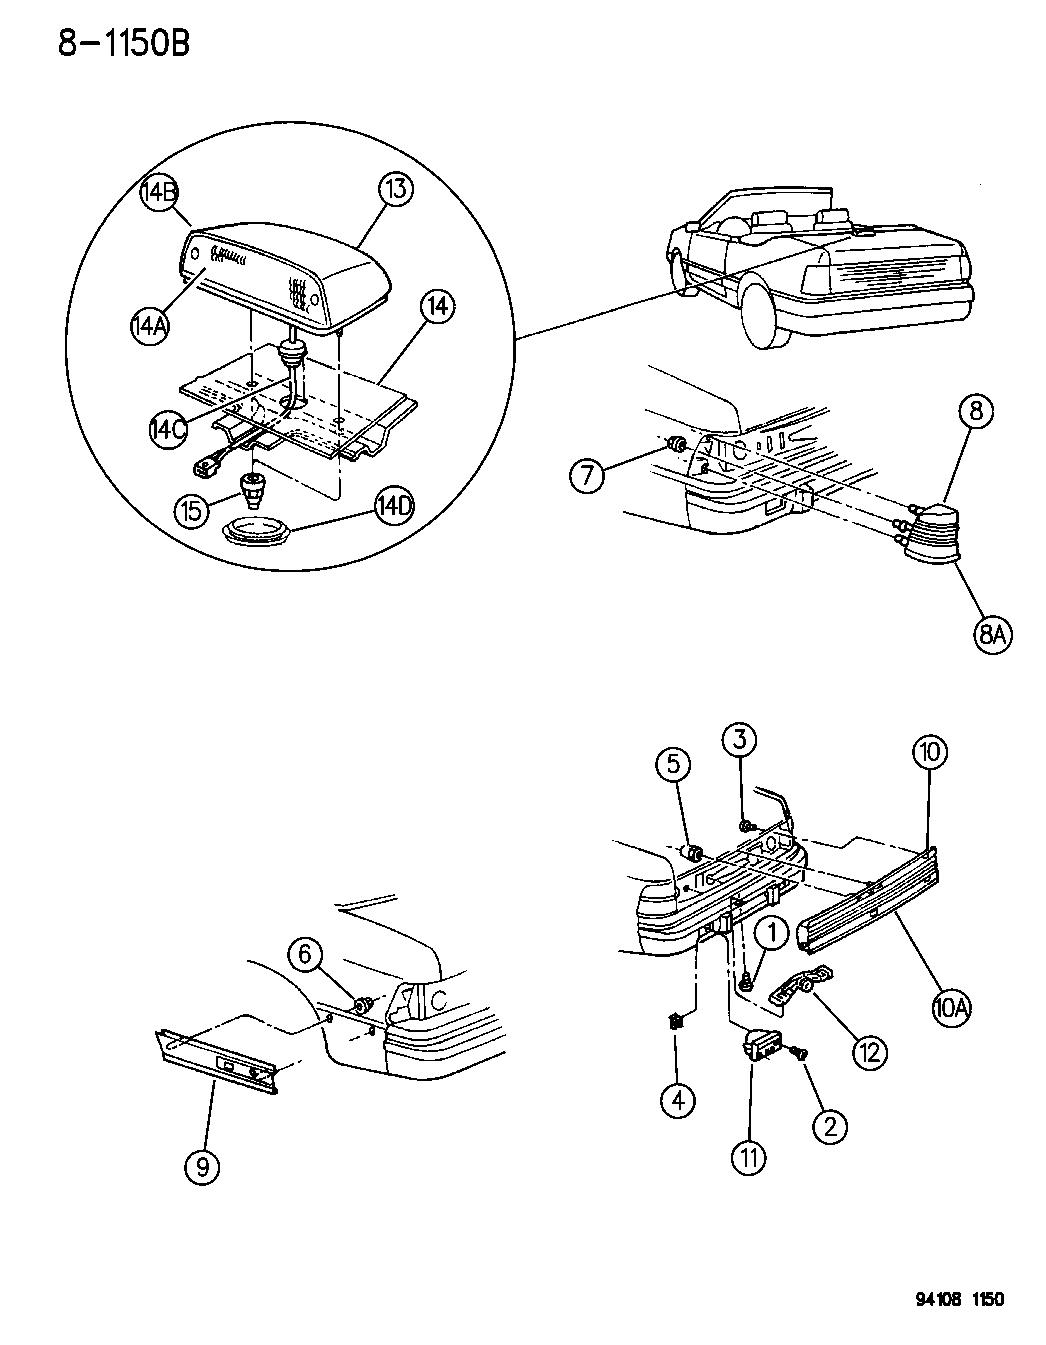 1995 Chrysler LeBaron Lamps & Wiring - Rear